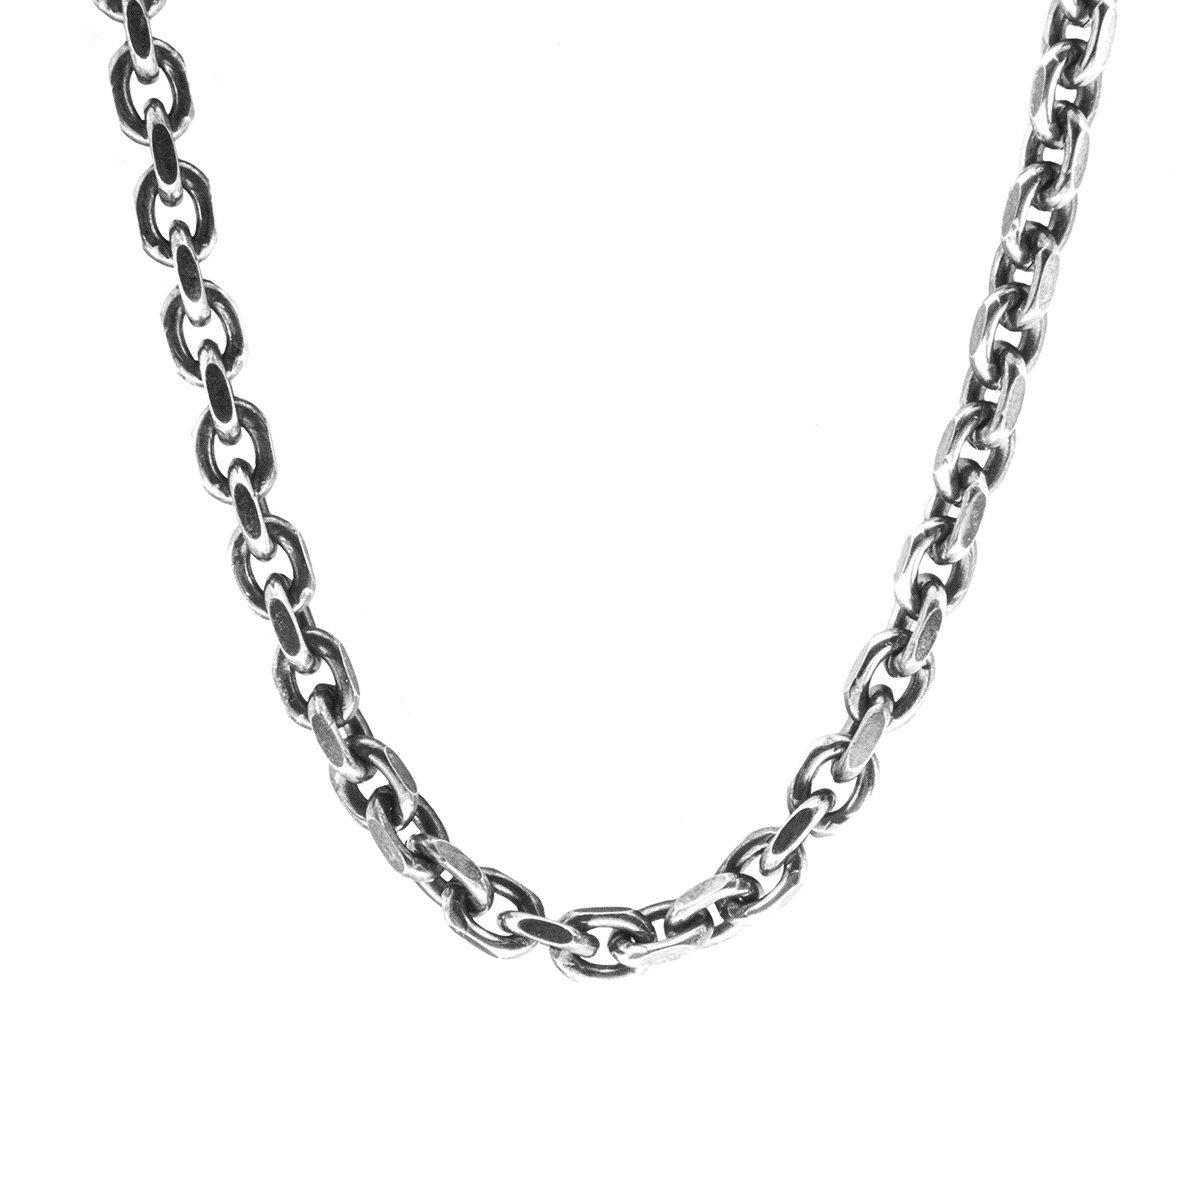 Anchor & Crew Salcombe Voyage Silver Necklace Pendant in Metallic